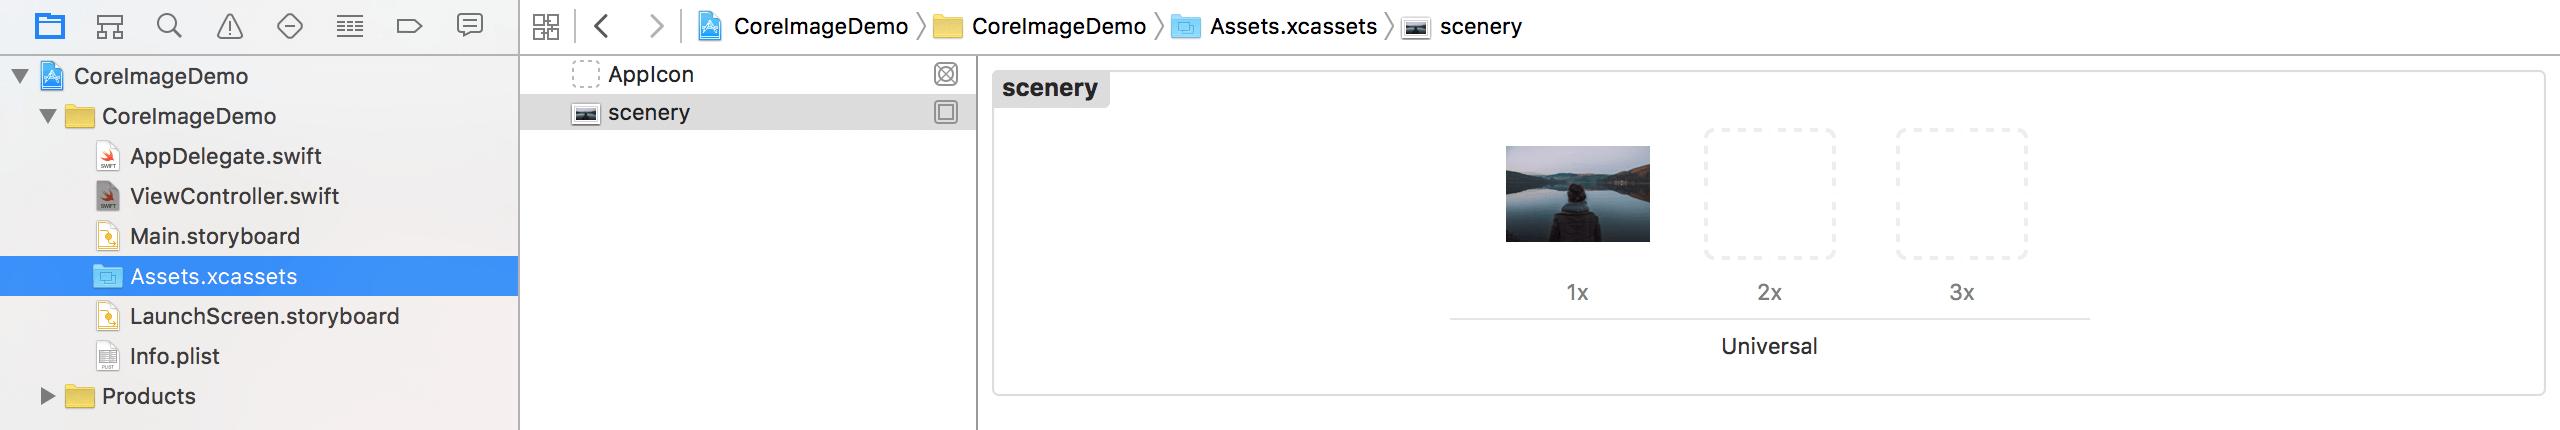 core-image-asset